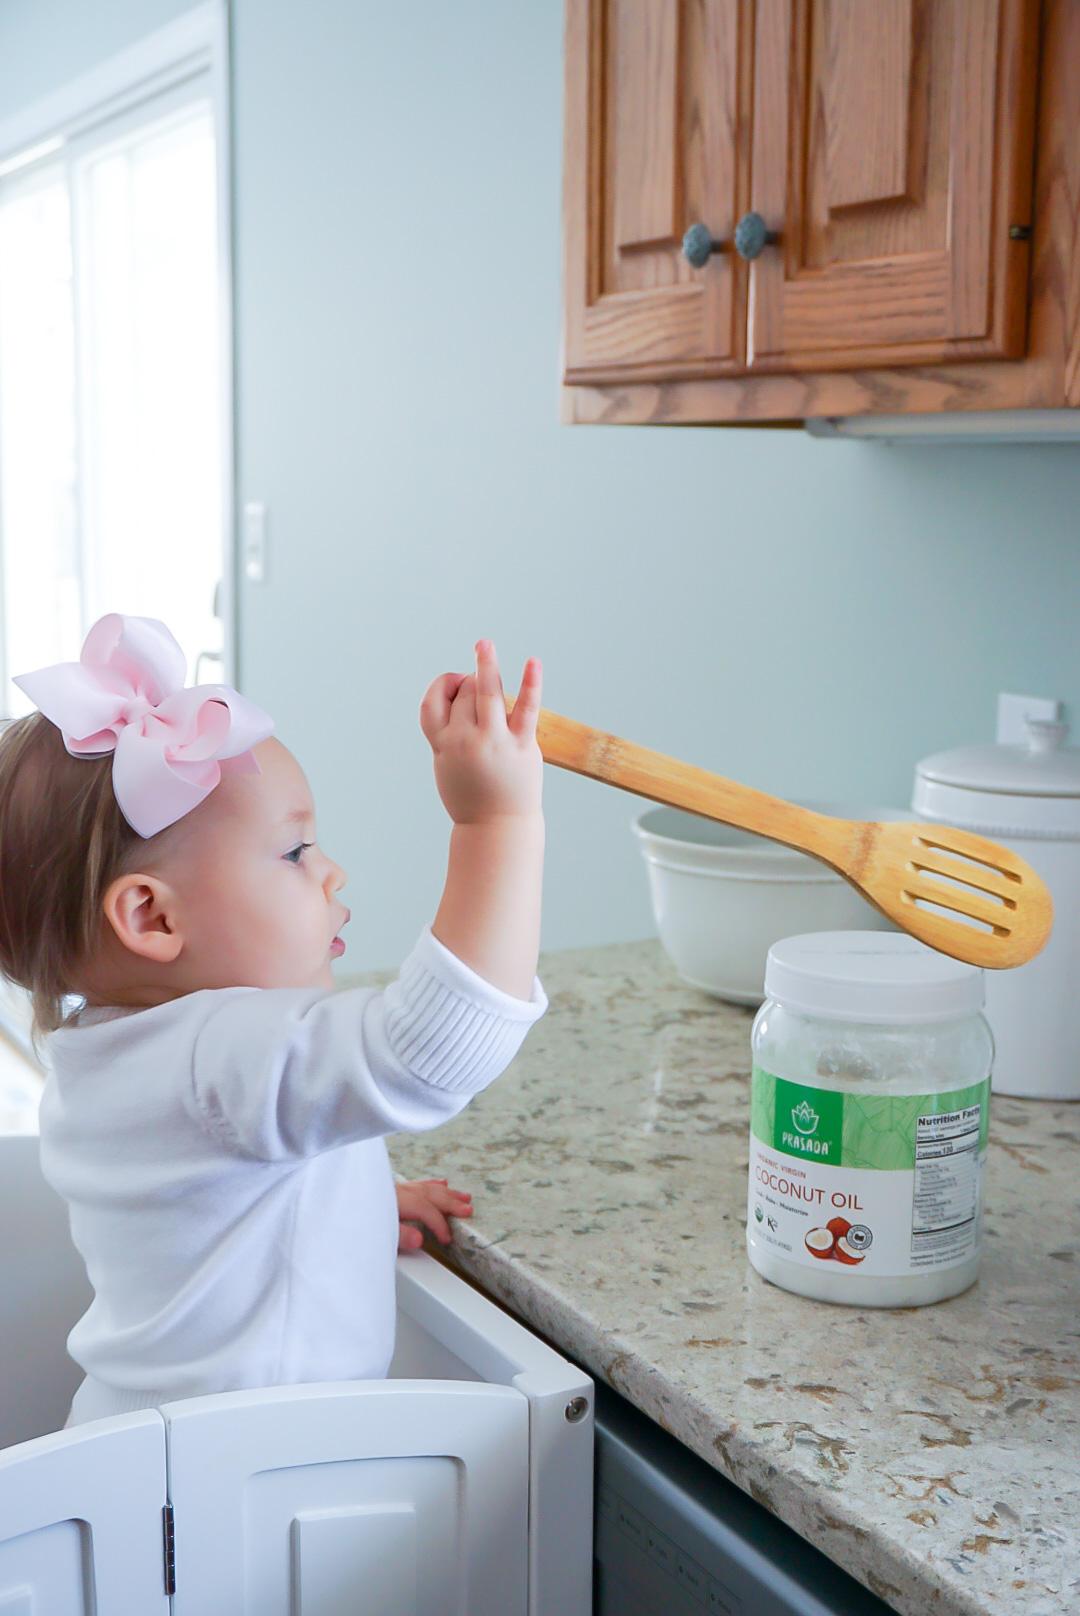 dairy-free desserts, dairy-free chocolate chip cookies, dairy-free foods for toddlers, dairy-free cookies